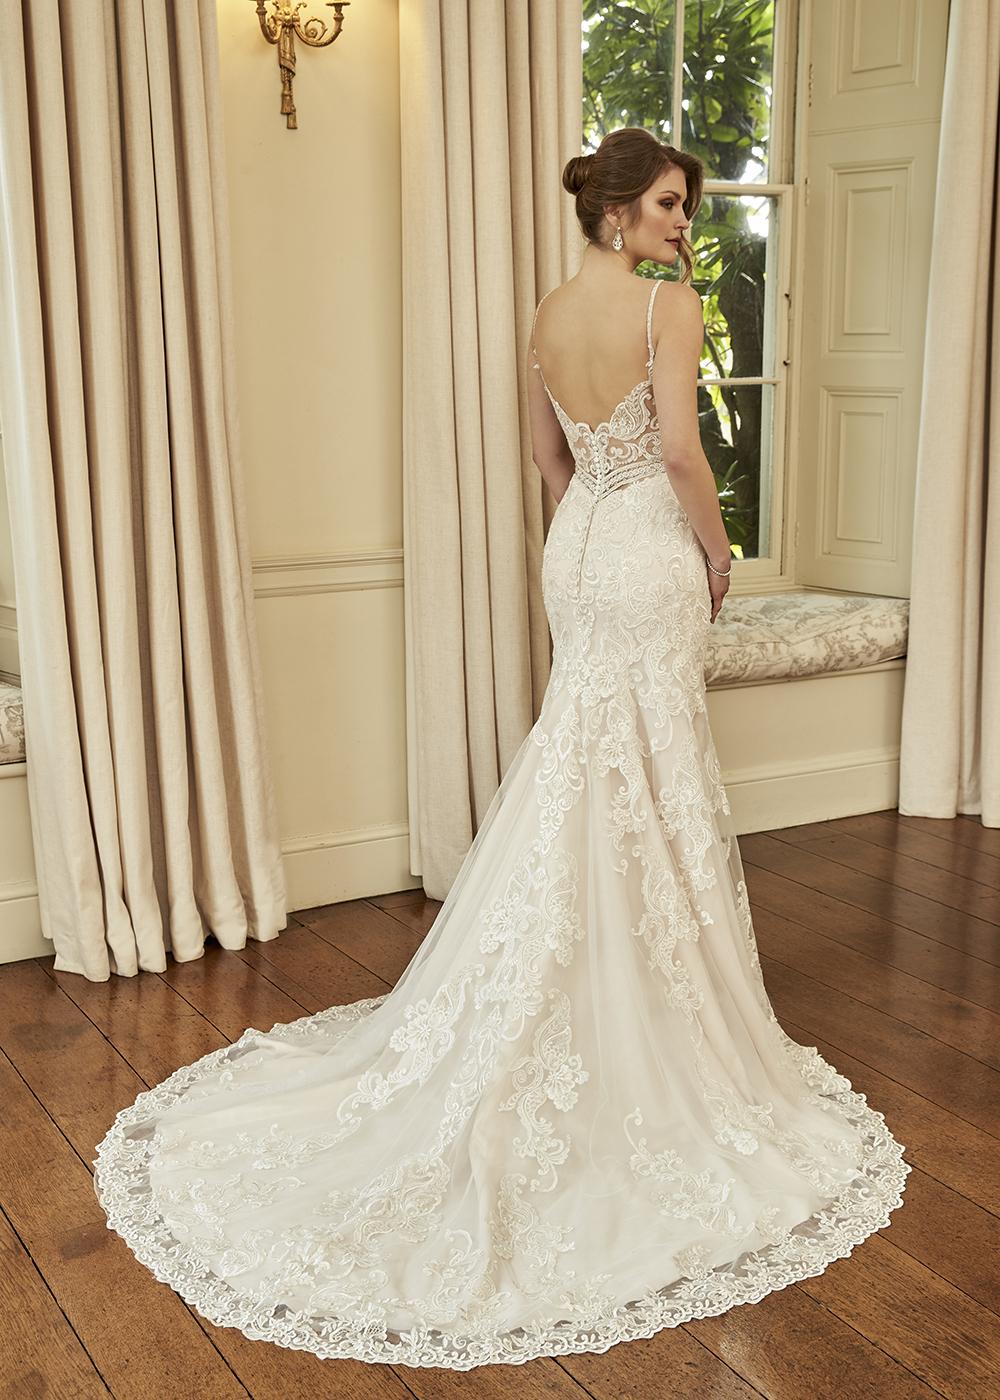 Wedding dress shop Scotland fROX OF fALKIRK